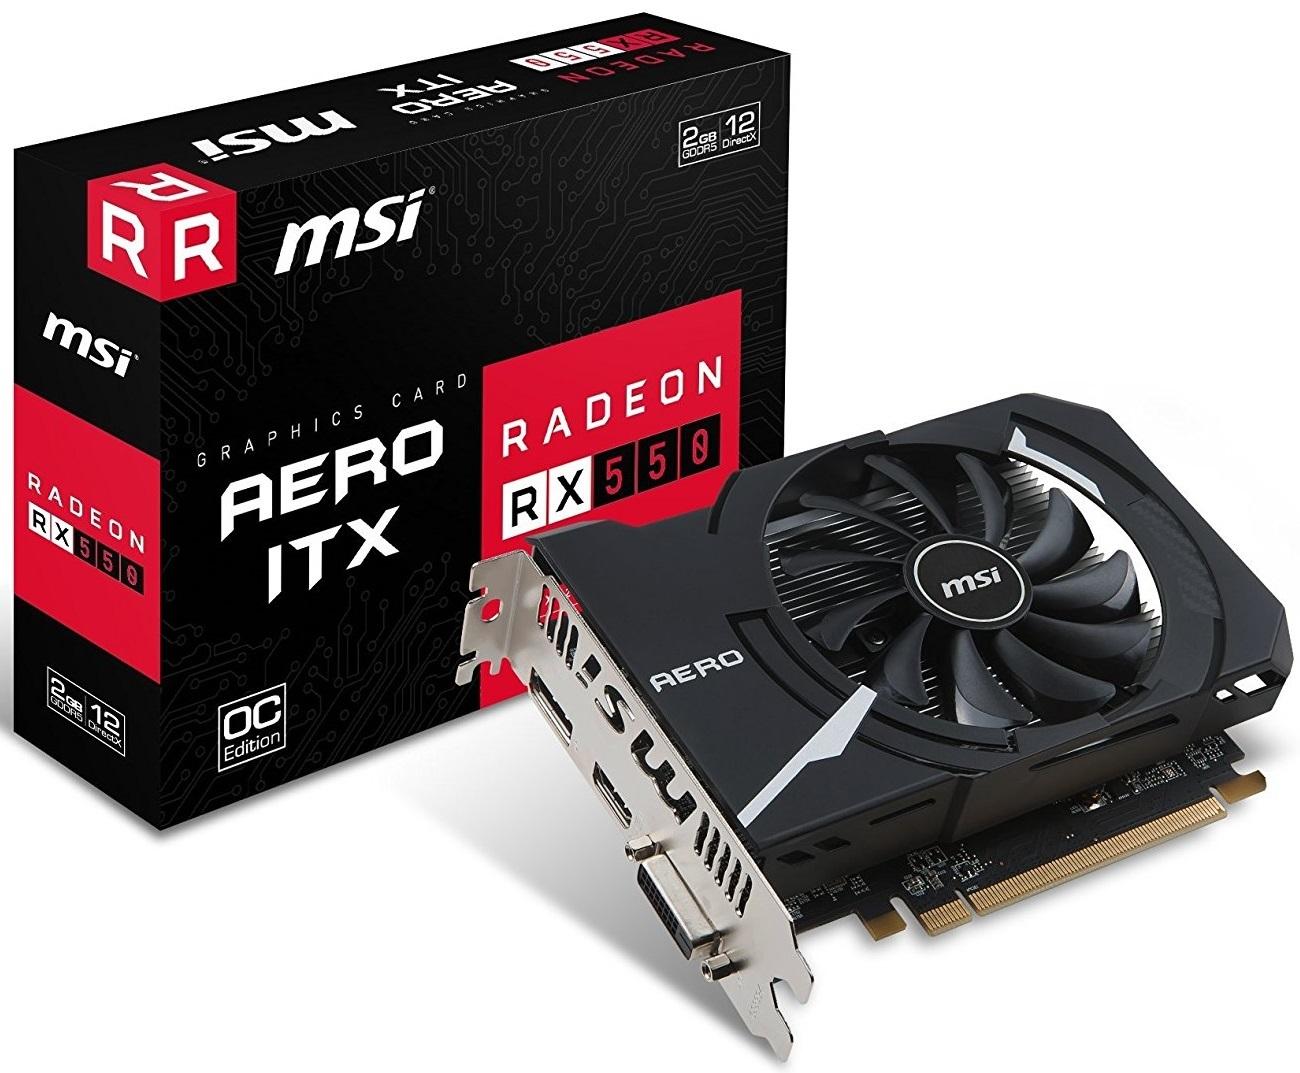 MSI Radeon RX 550 Aero 2GB Graphics Card image